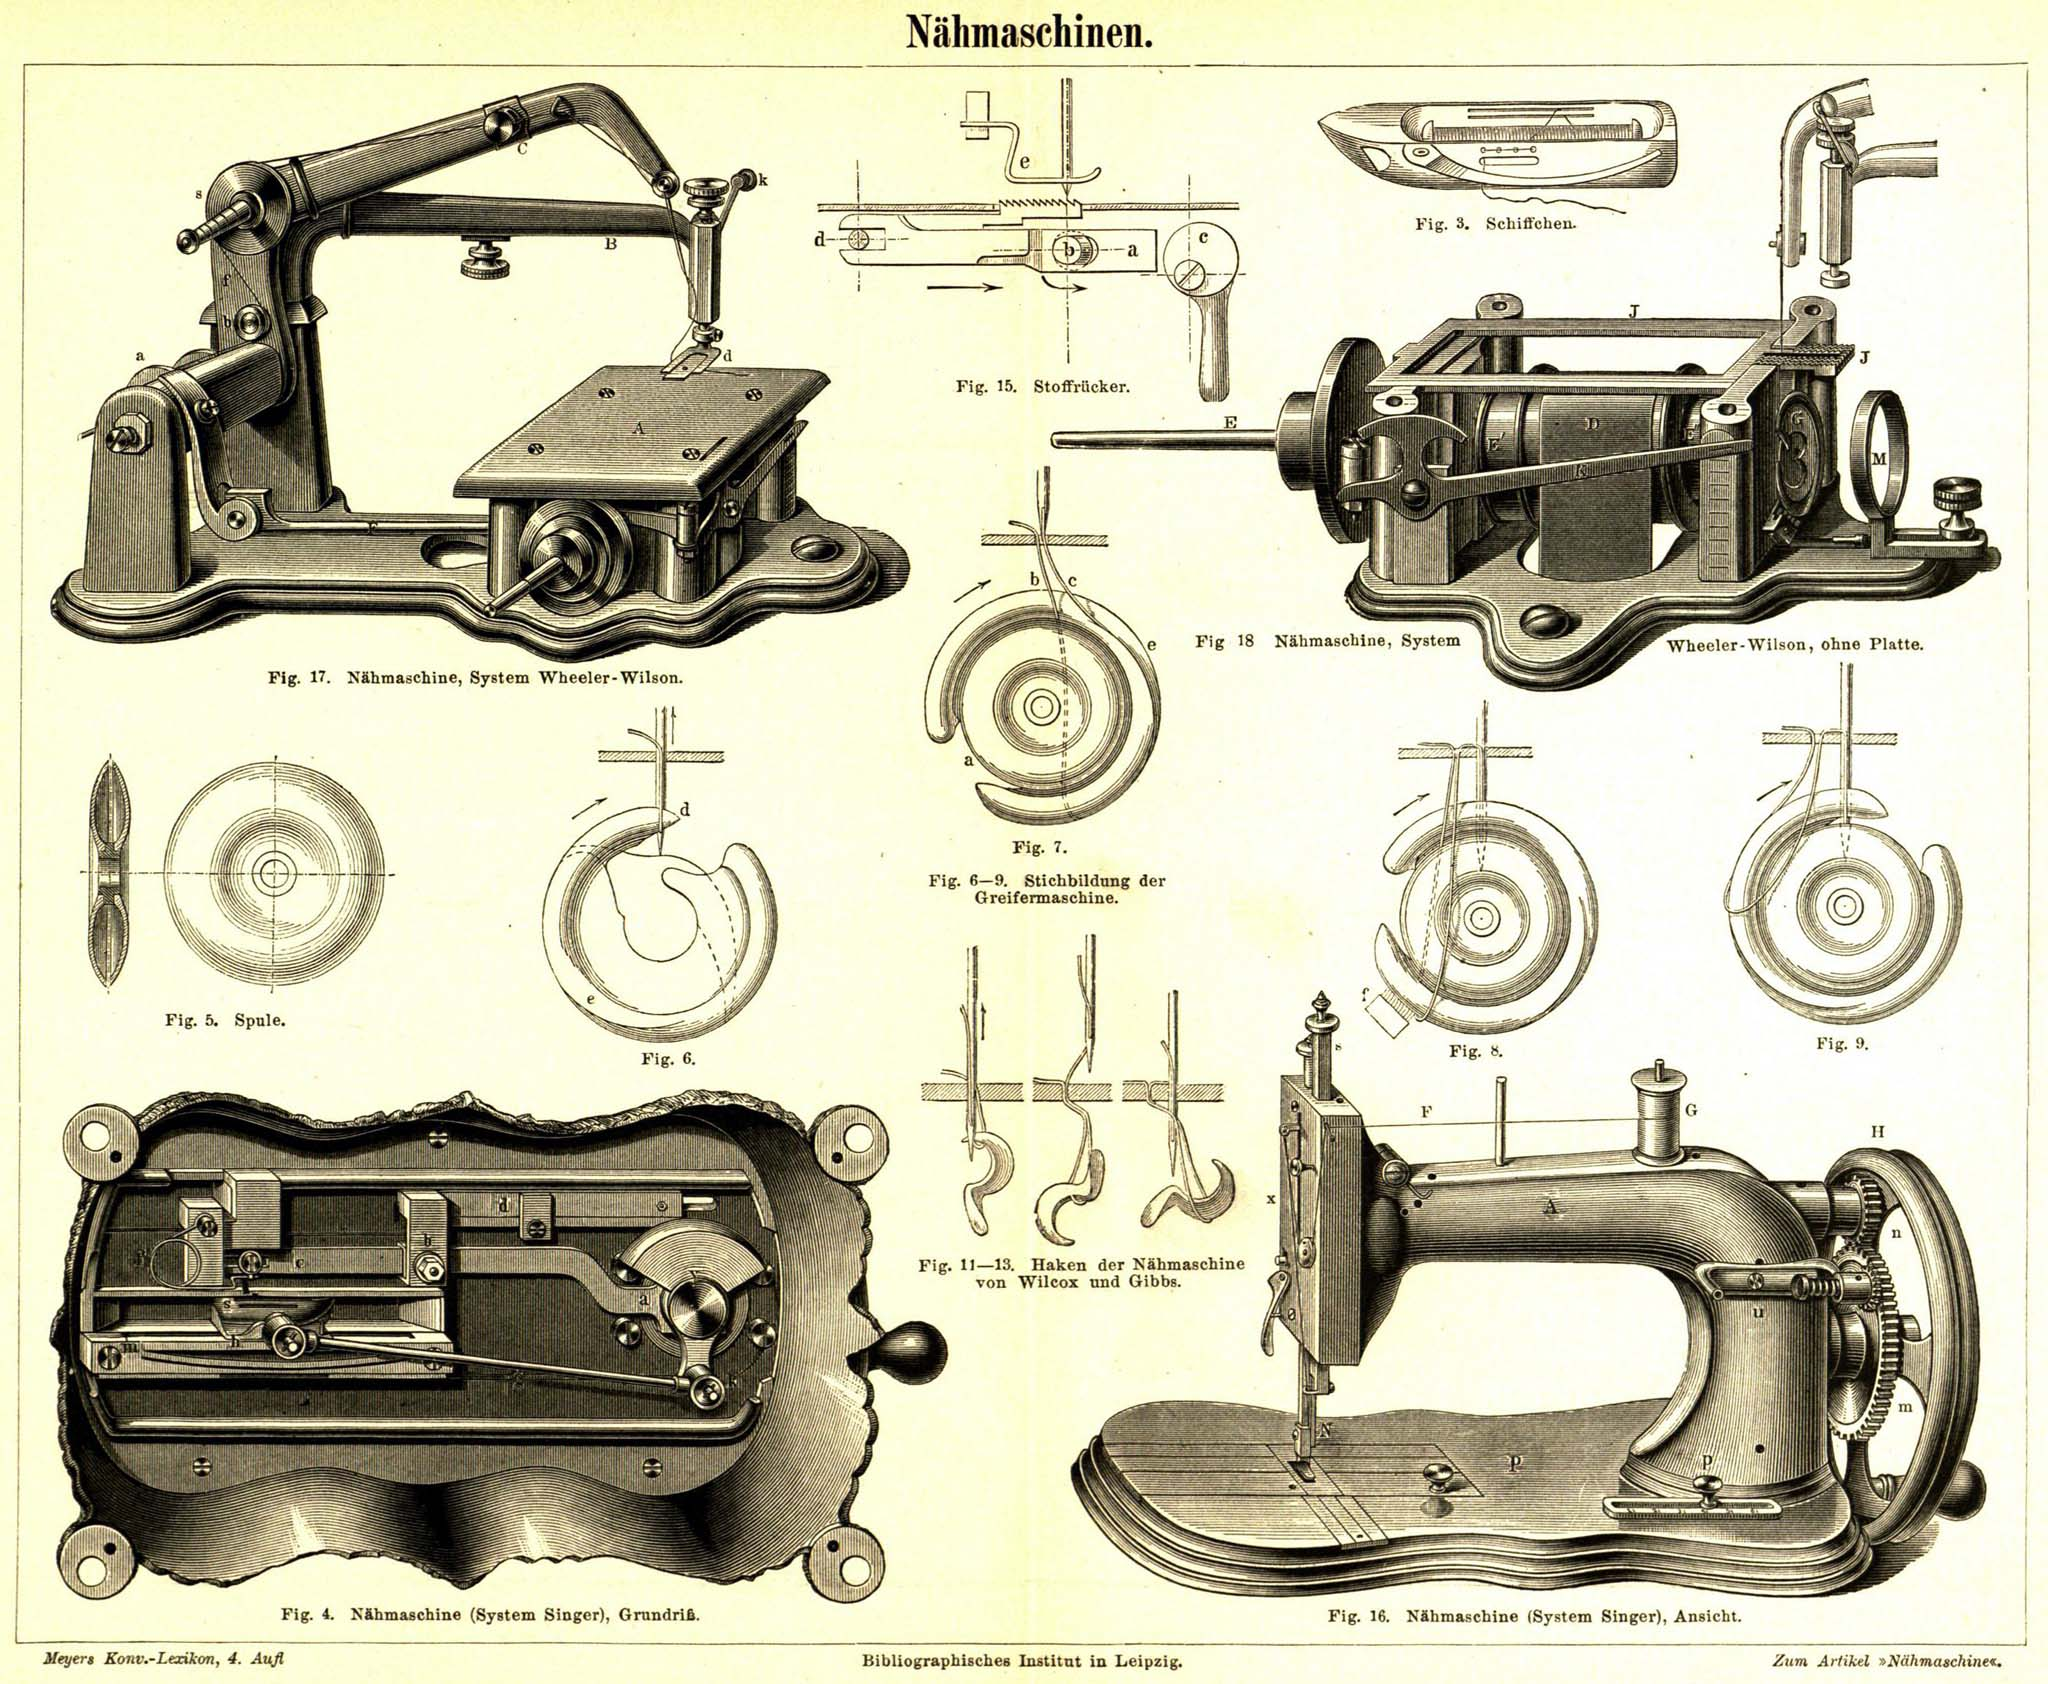 retrobib  Seite aus Meyers Konversationslexikon  ~ Nähmaschine Wien